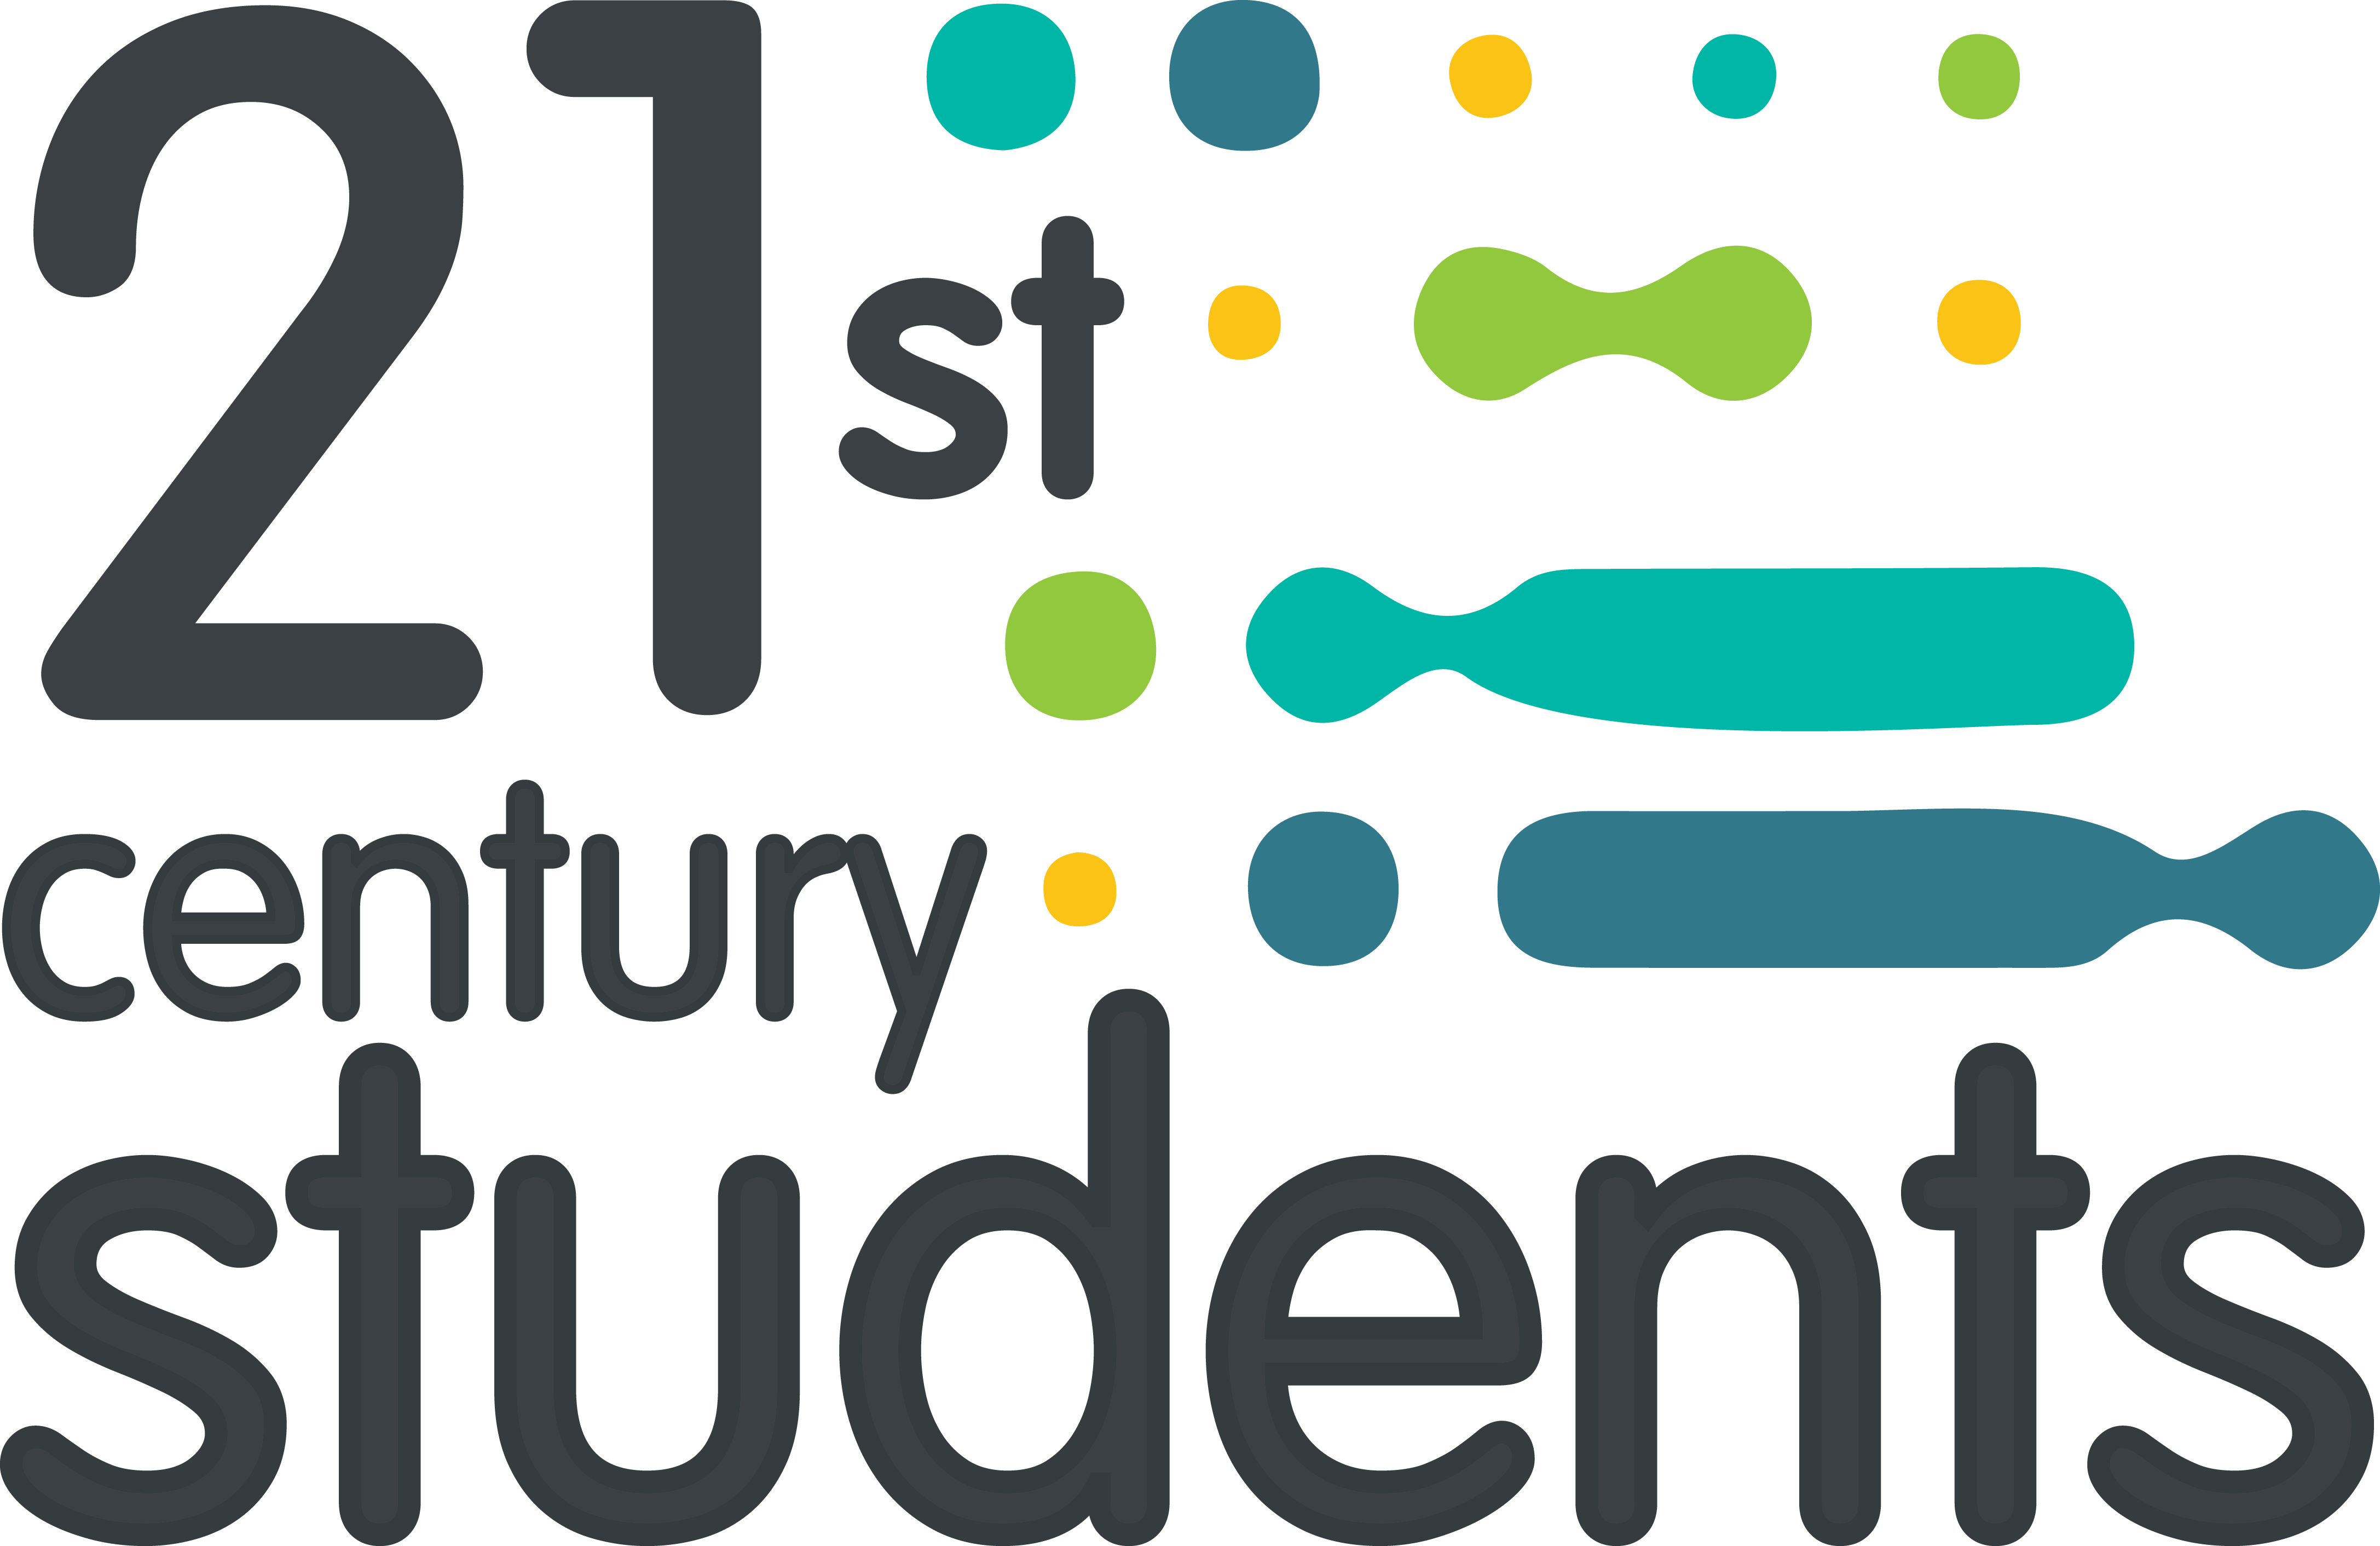 21st Century Students